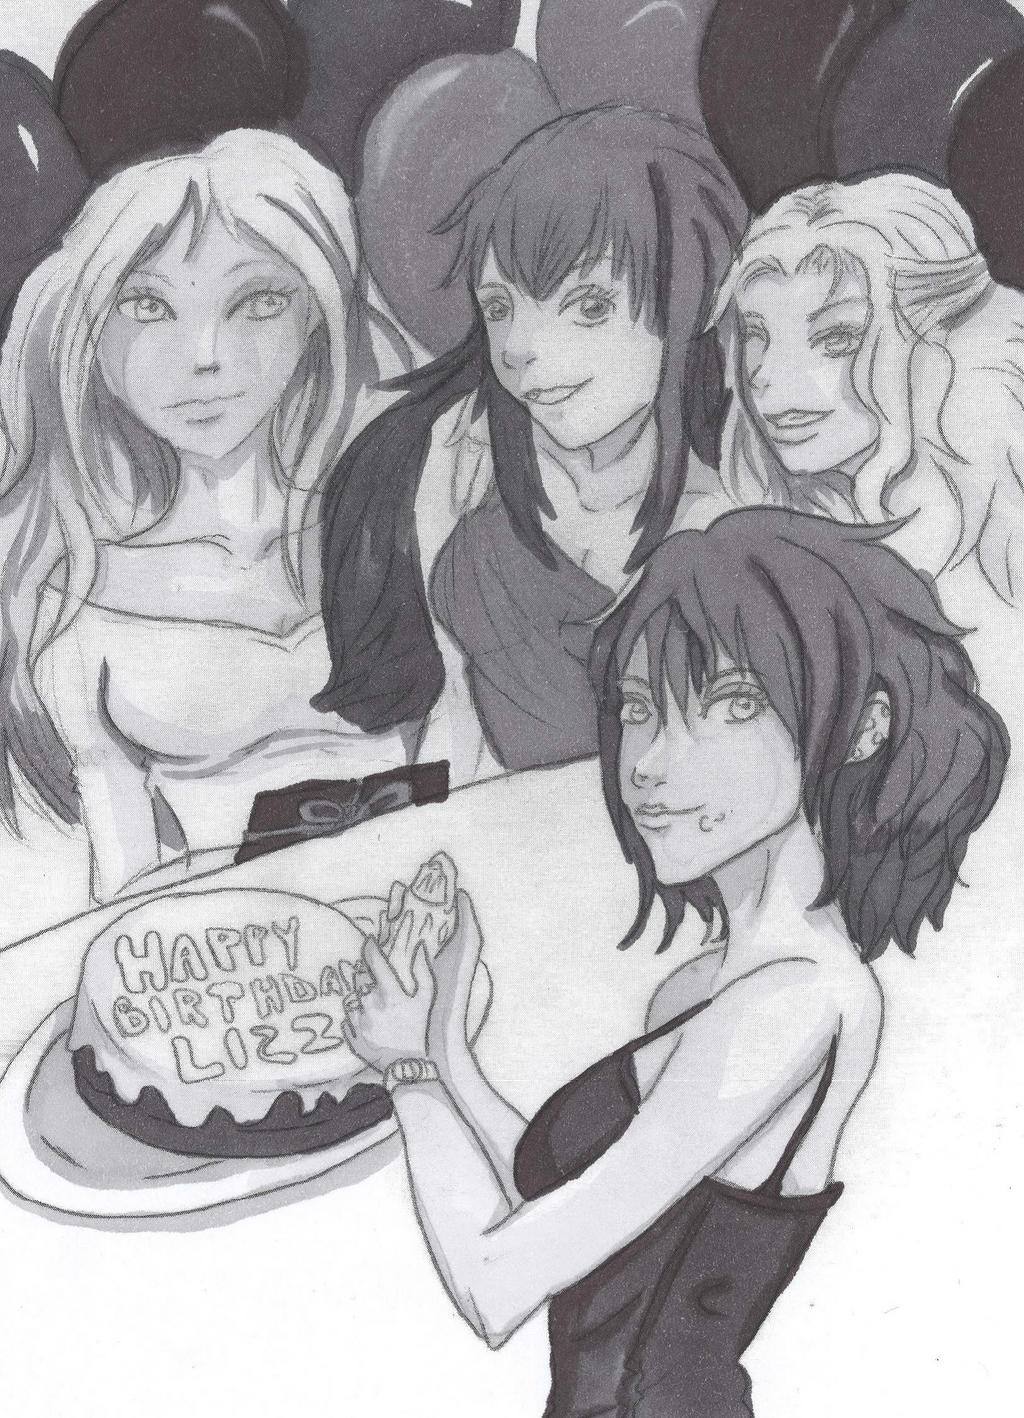 Happy Birthday Lizzie by tinta-estudio